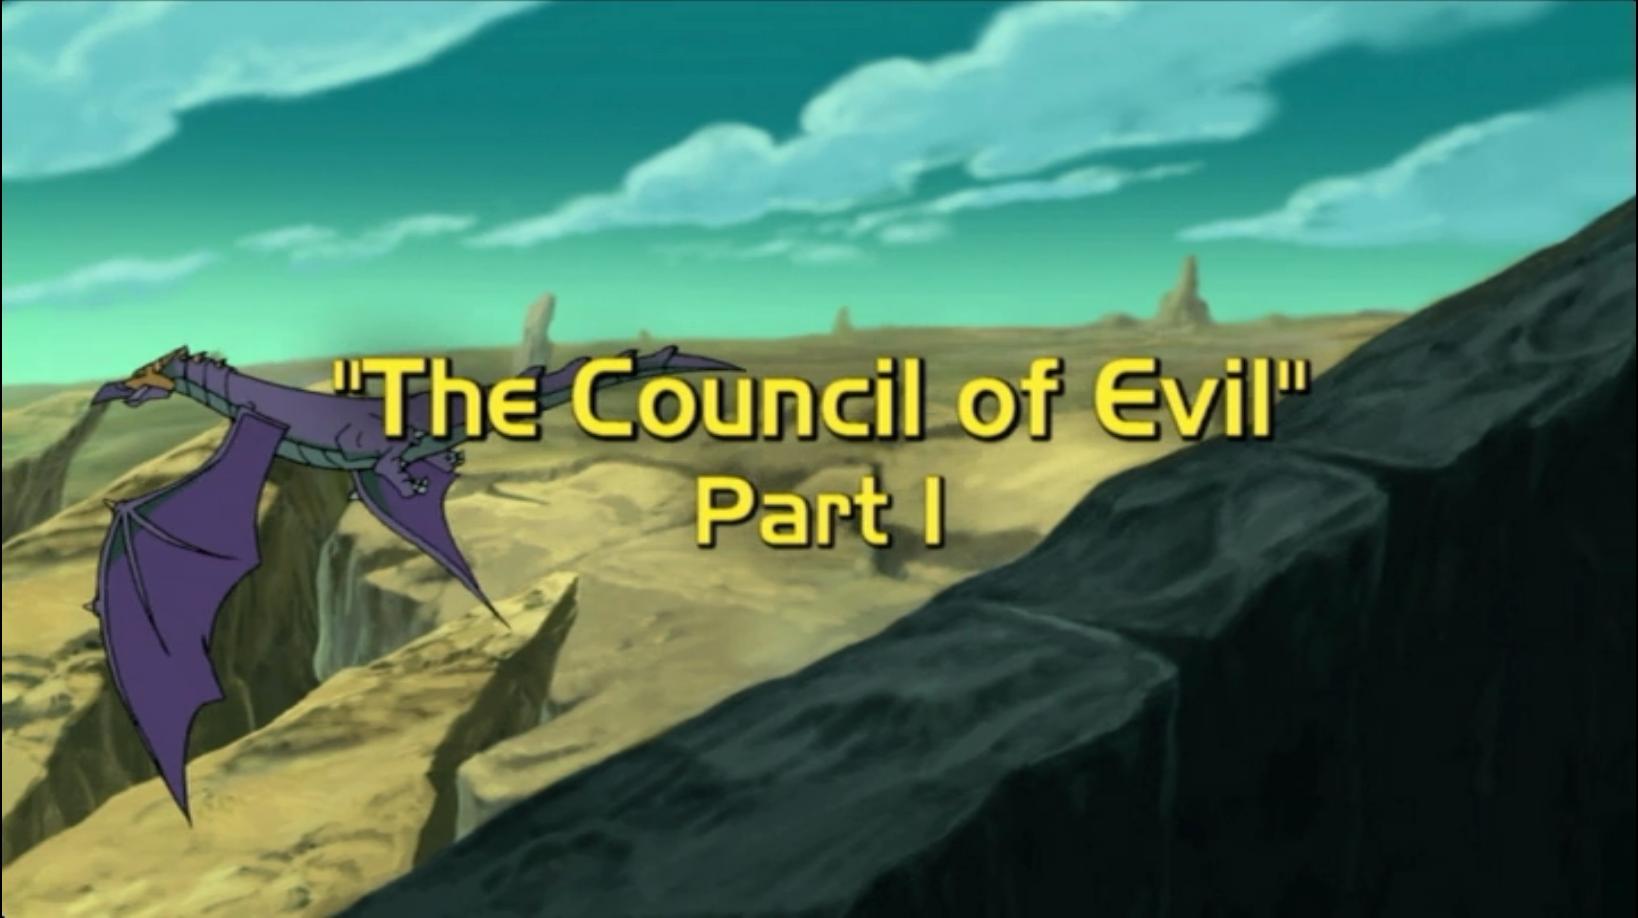 The Council of Evil, Part 1